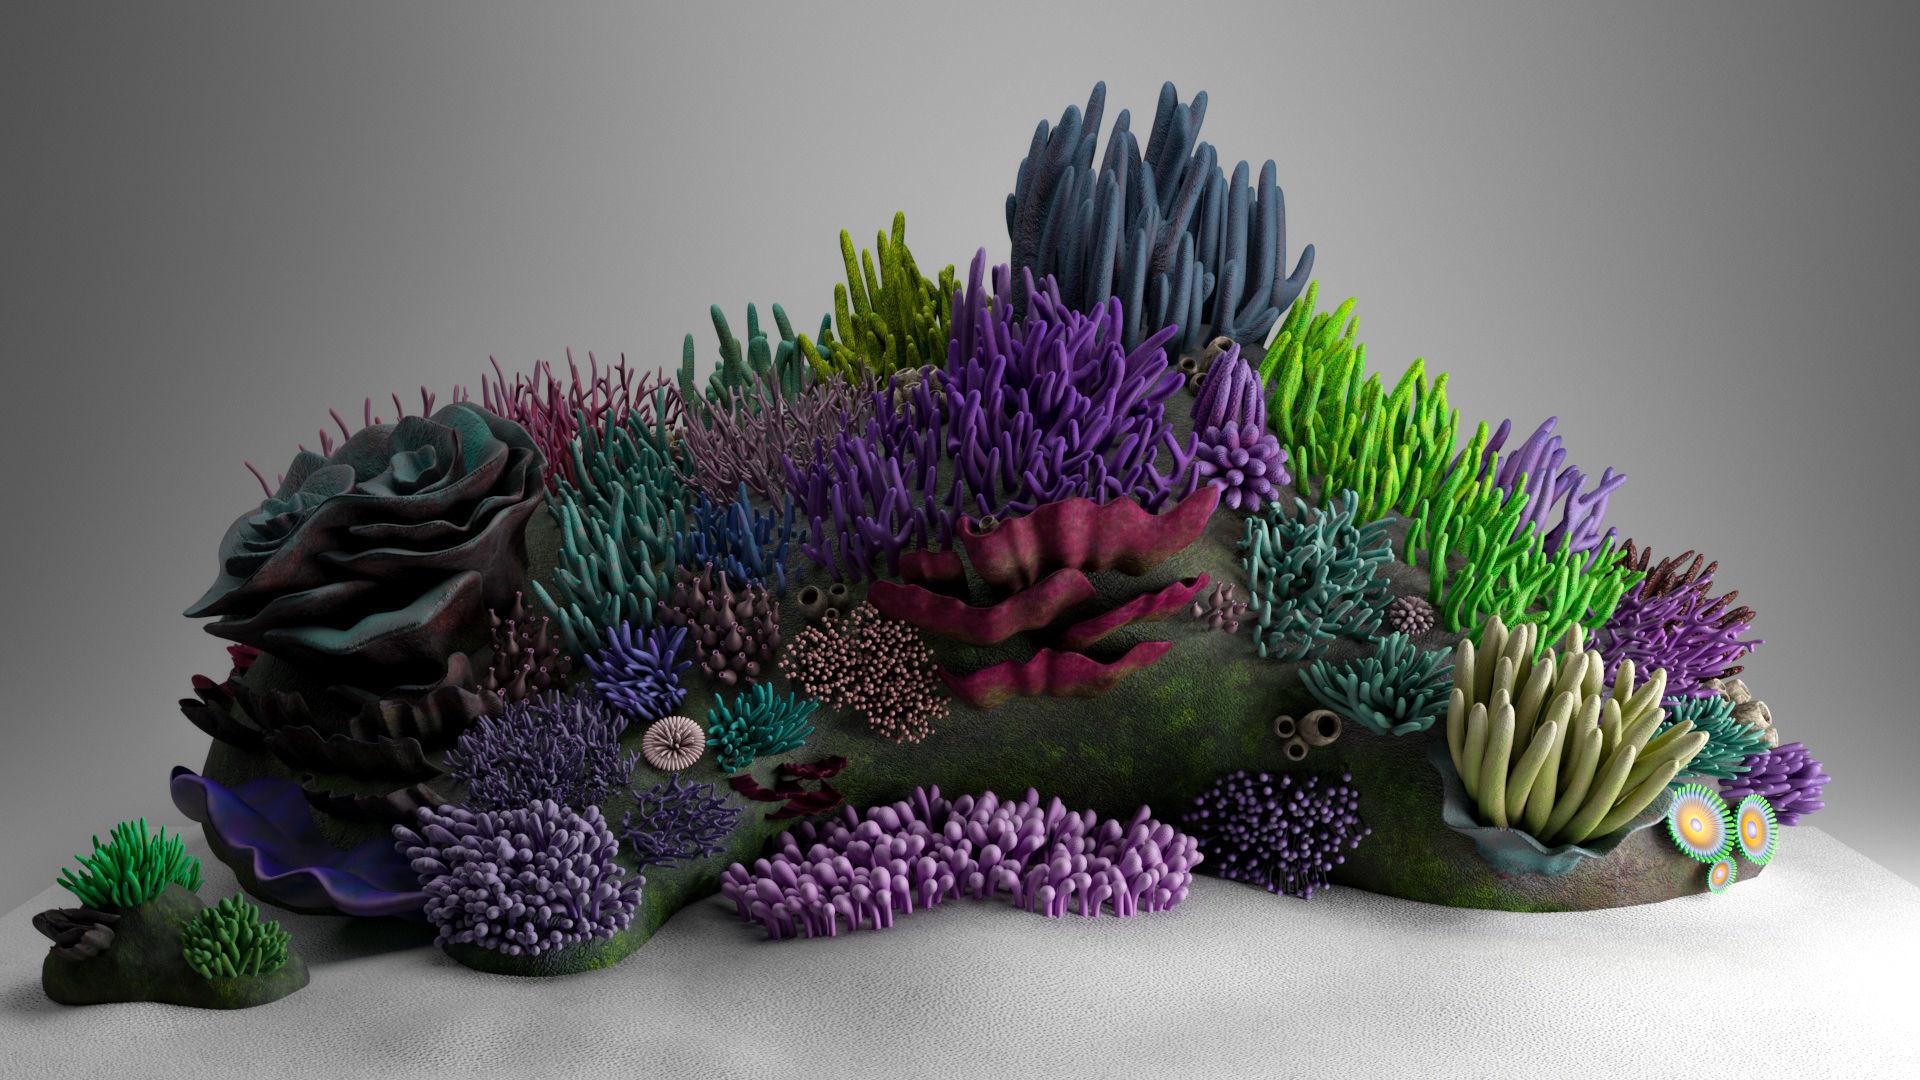 3D Underwater Coral Reef Habitat Ocean